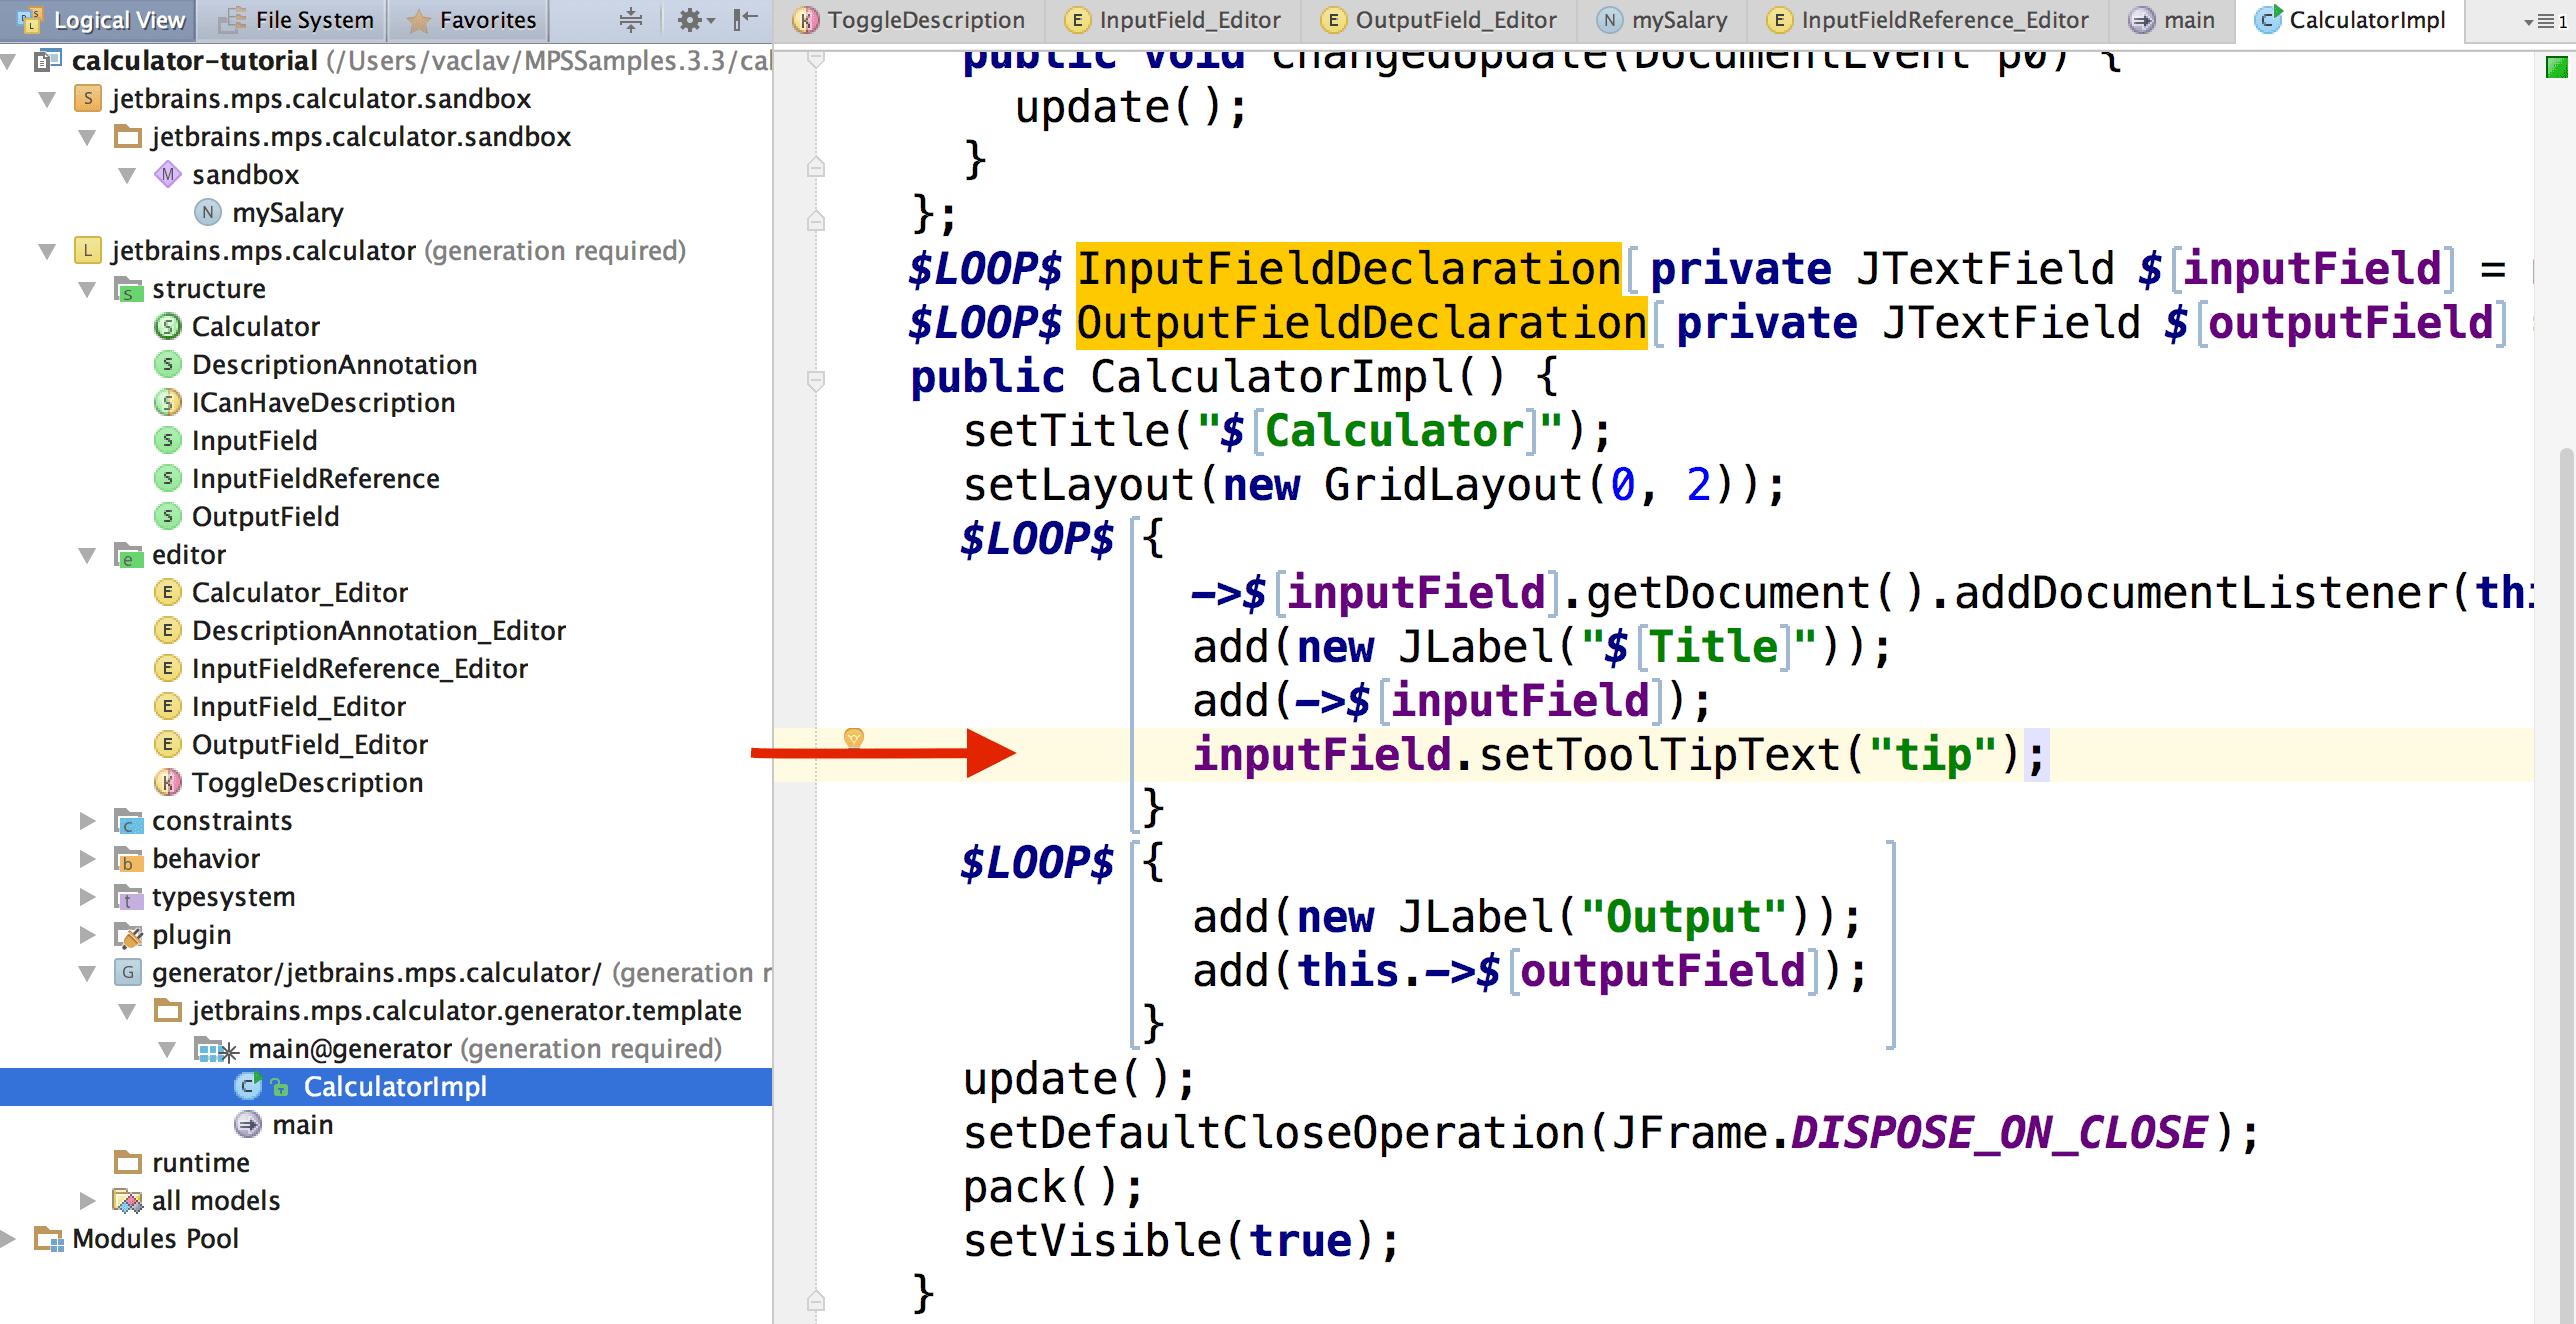 Creating JTextFields